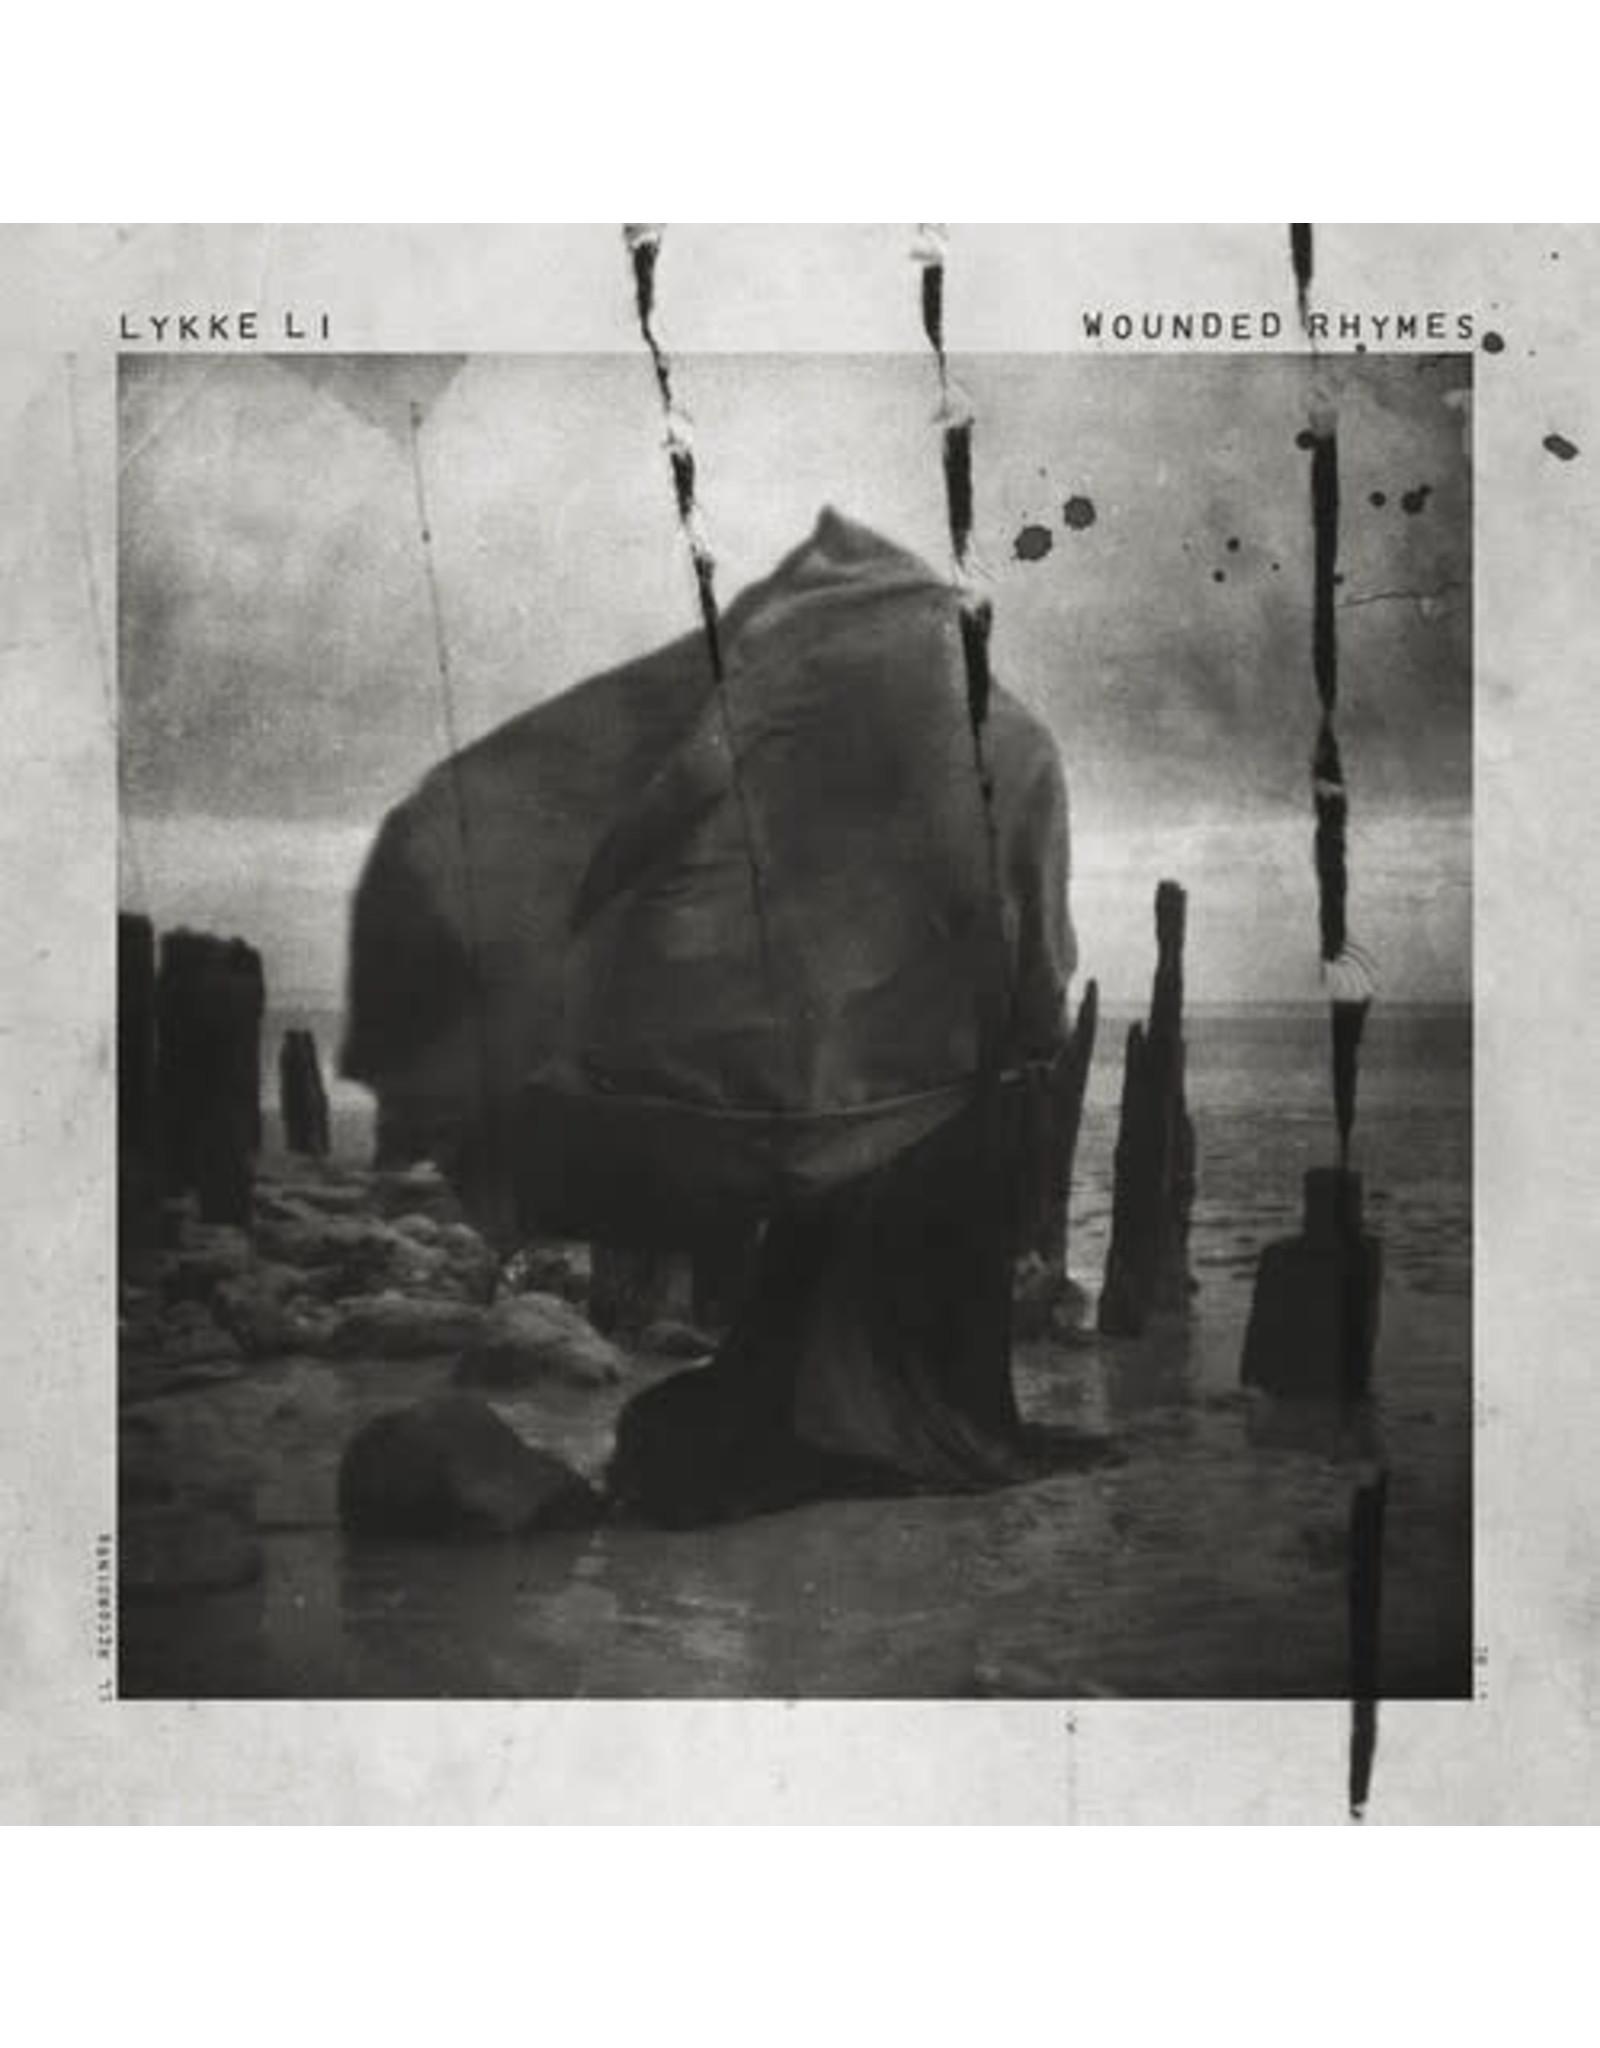 New Vinyl Lykke Li - Wounded Rhymes (10th Anniversary Ed., 180g) 2LP